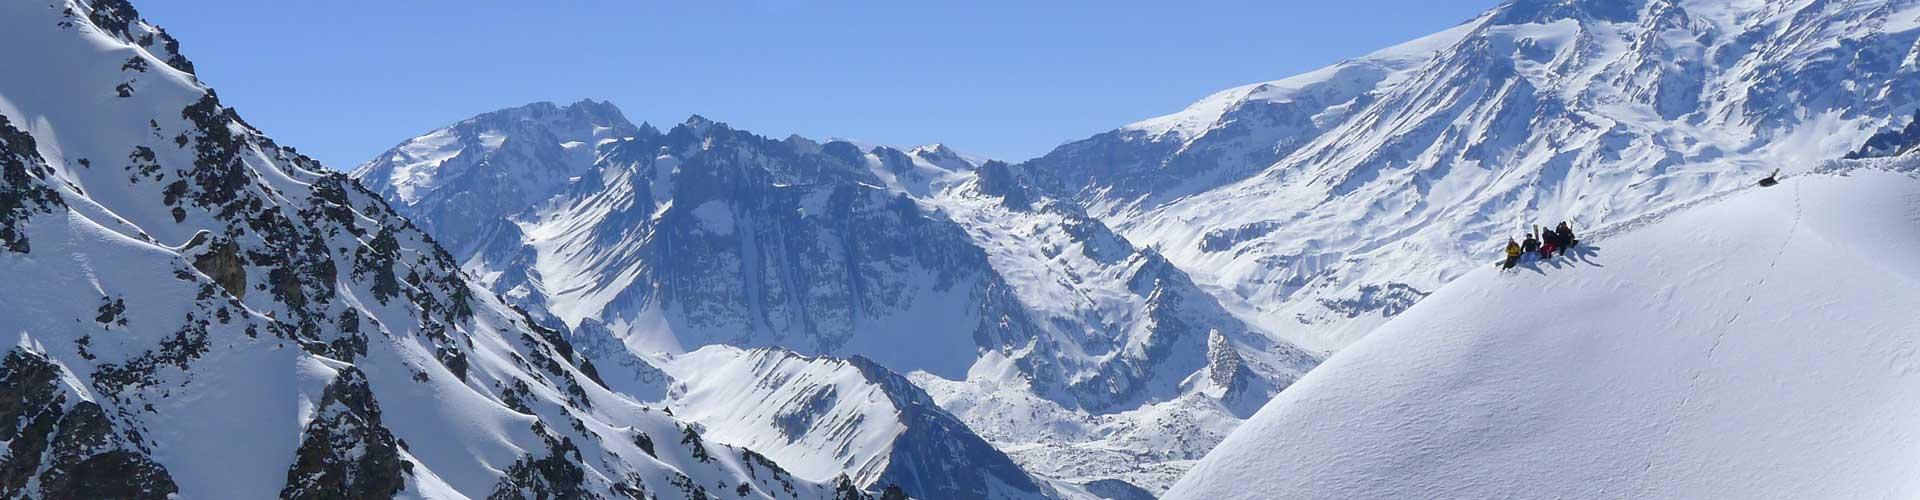 3 Days Andes Heli Ski Package – 4 People